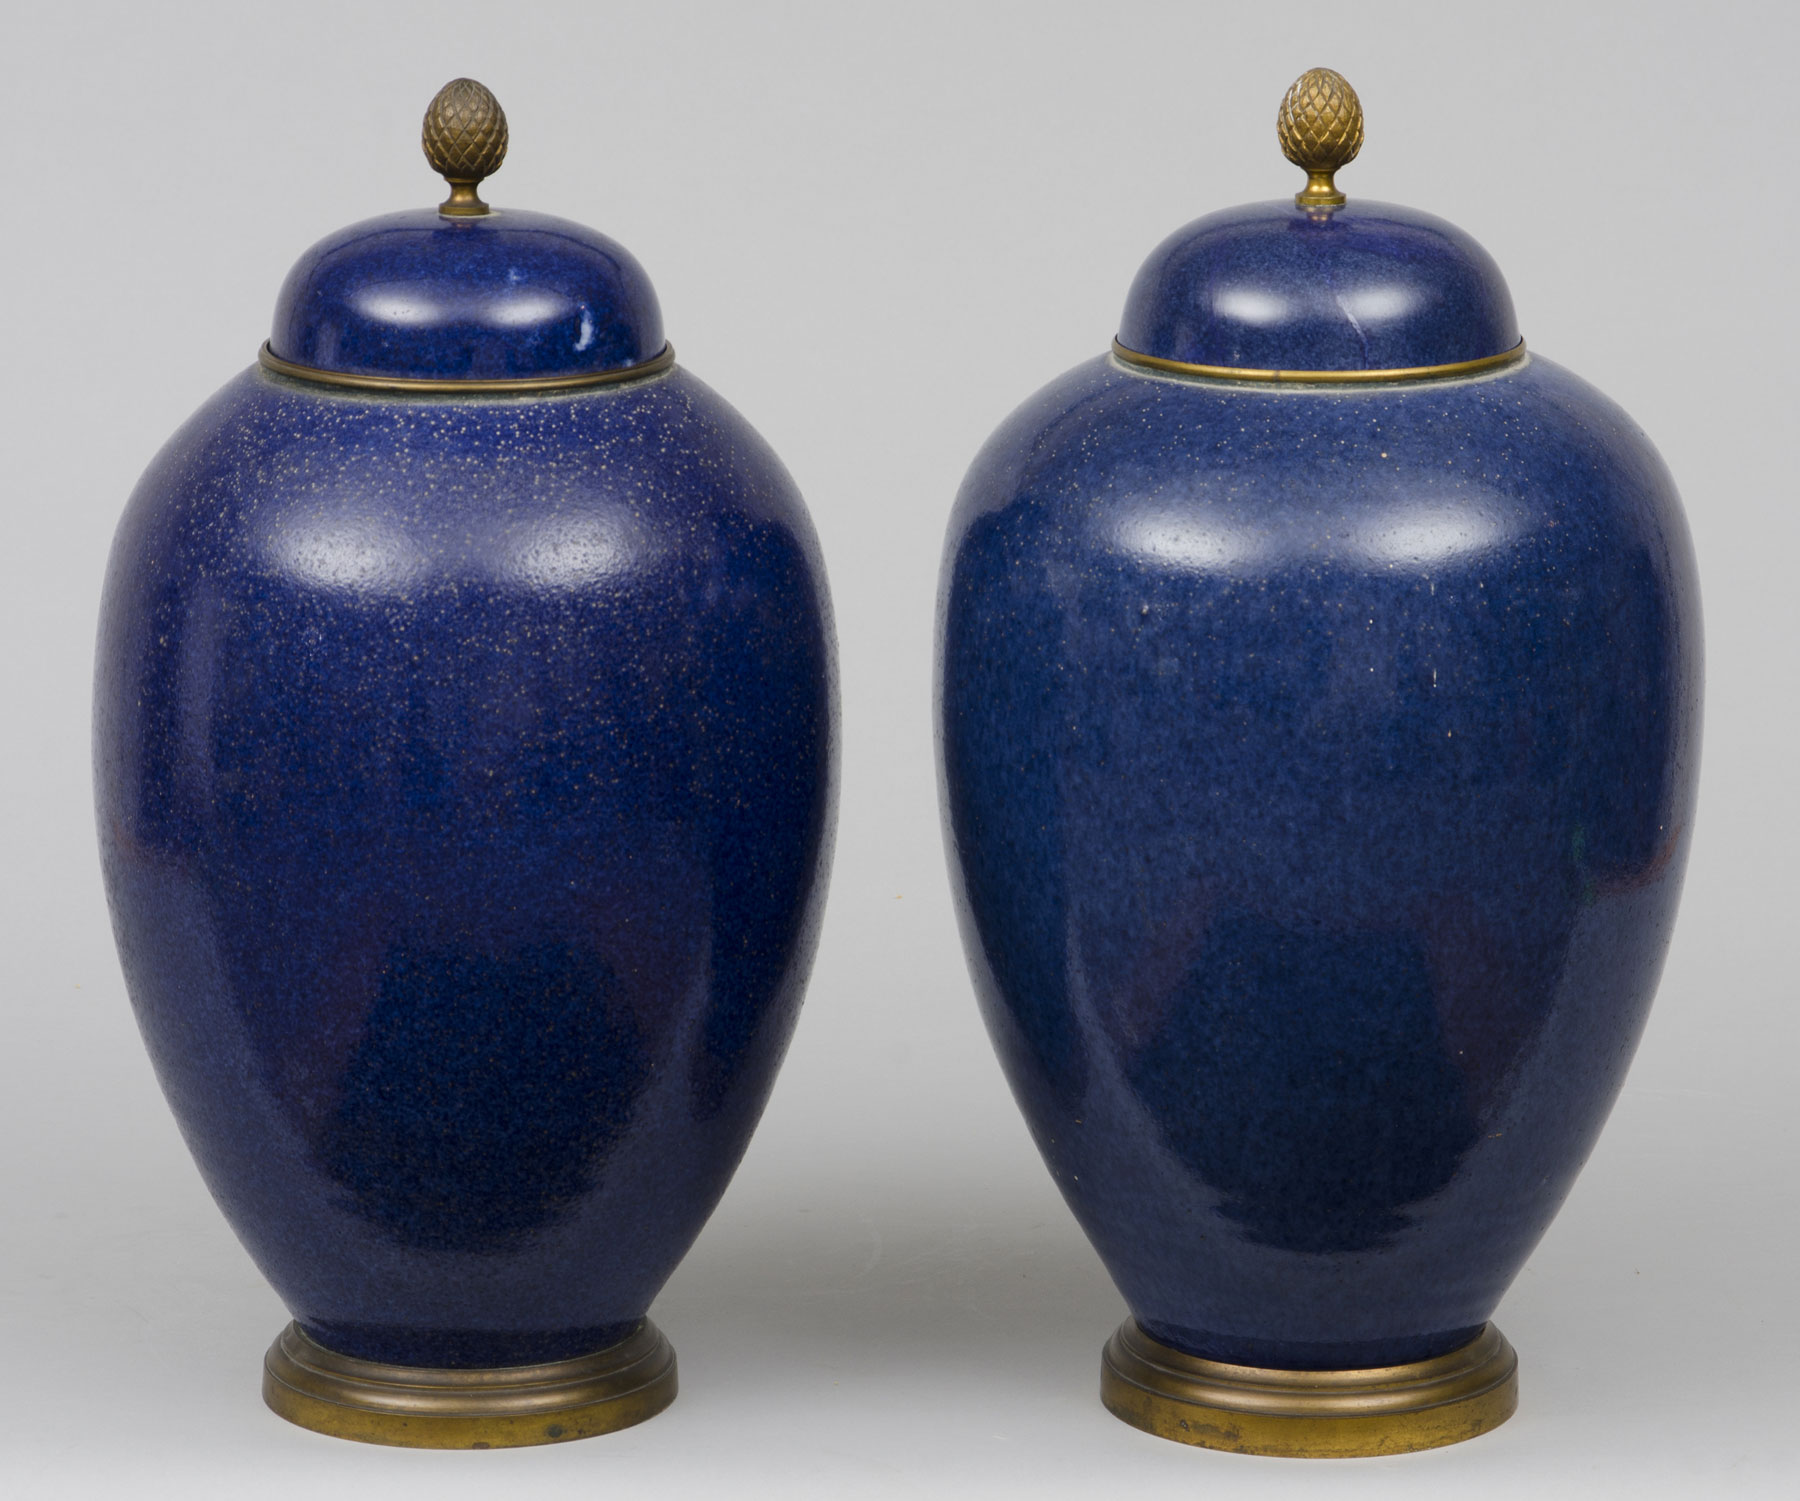 Product french samson cobalt blue vases french samson cobalt blue vases floridaeventfo Image collections